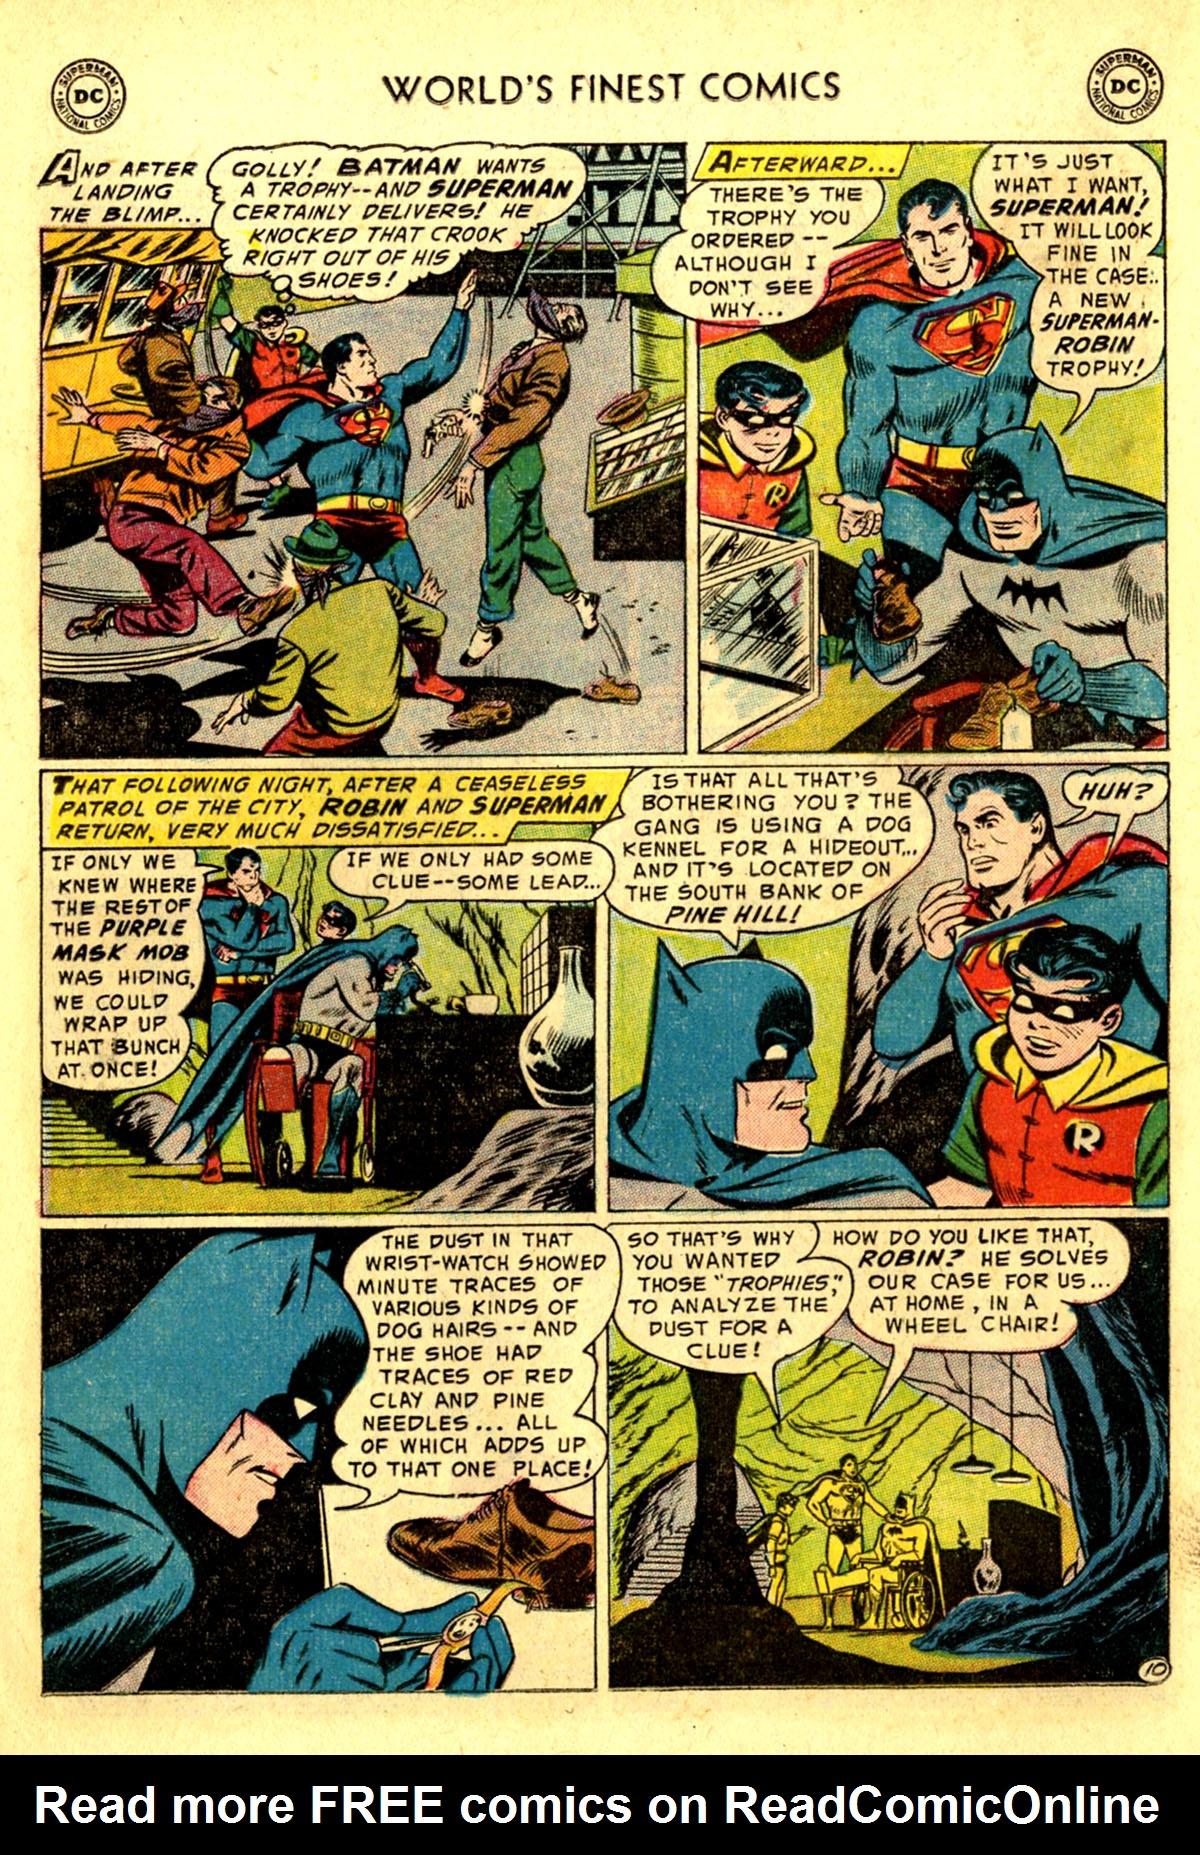 Read online World's Finest Comics comic -  Issue #75 - 12